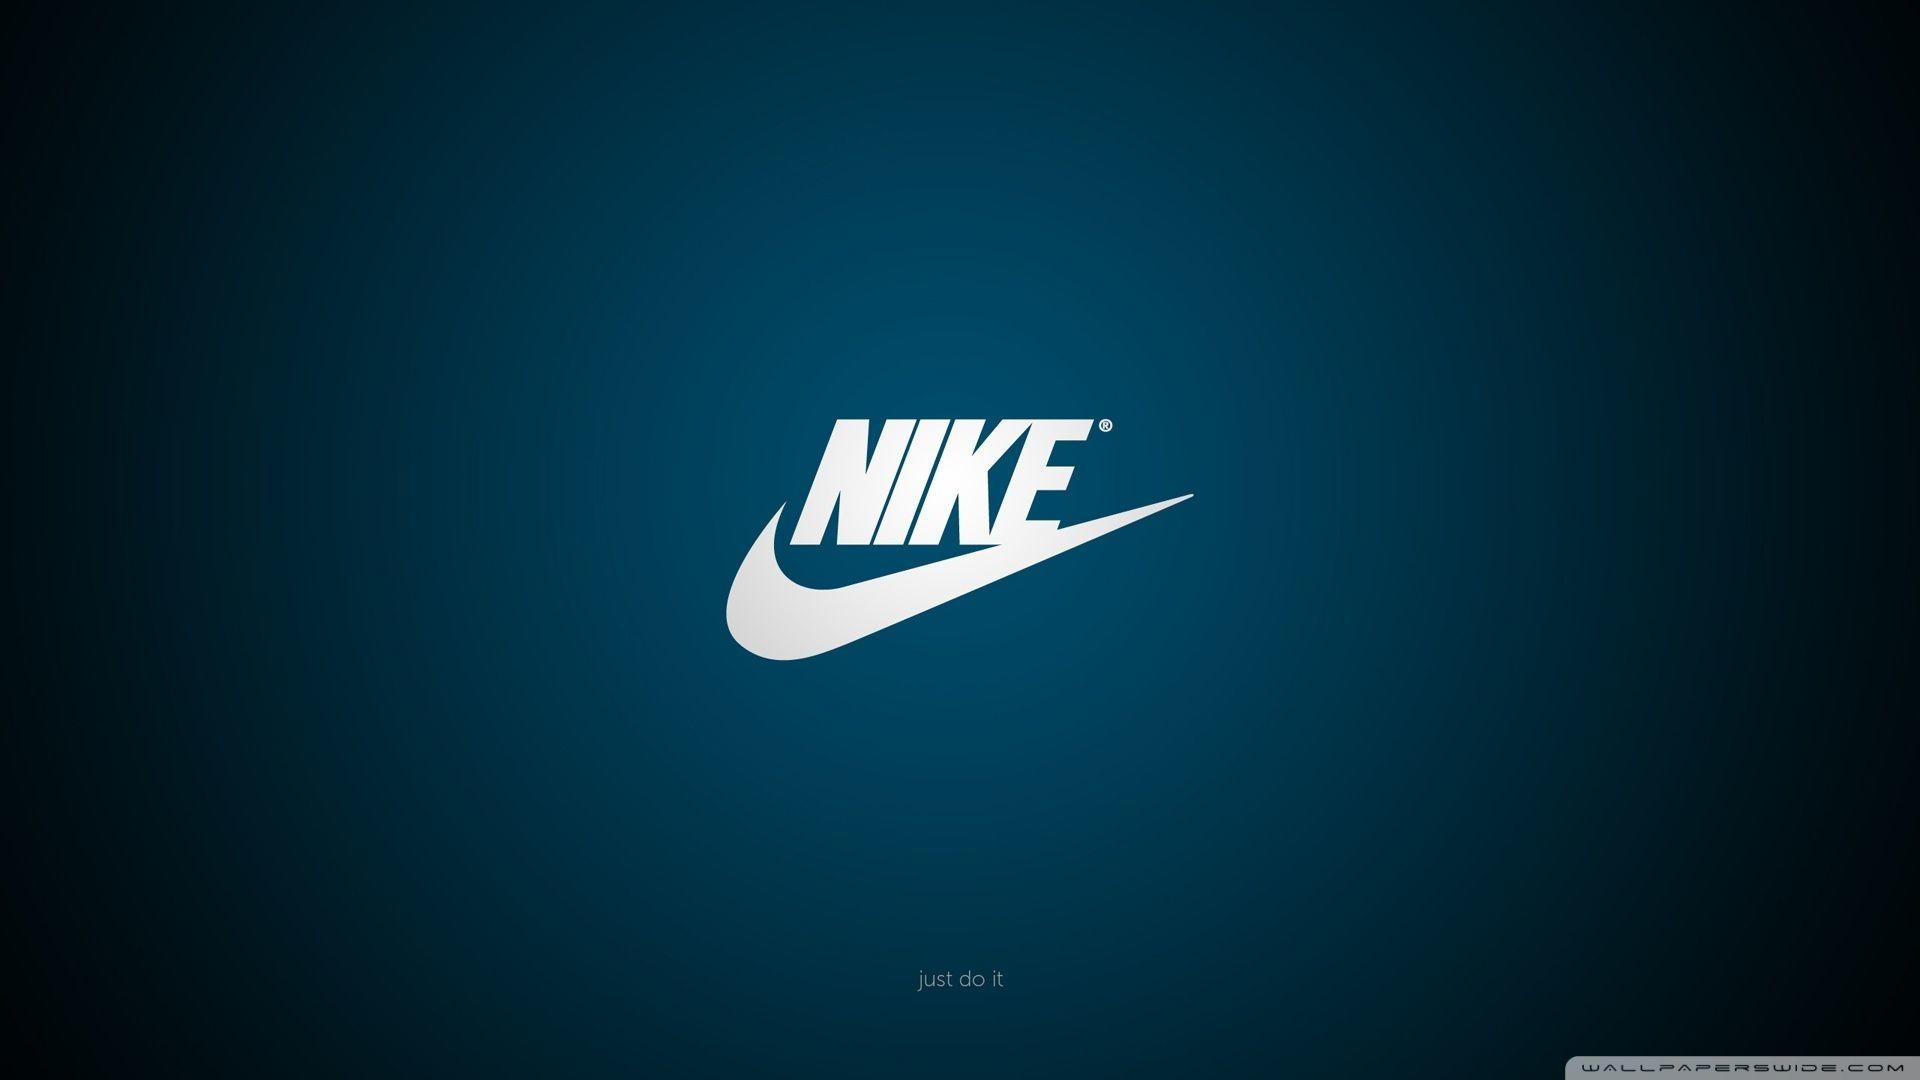 Puma, Adidas, Nike logo full hd wallpaper 1080p download